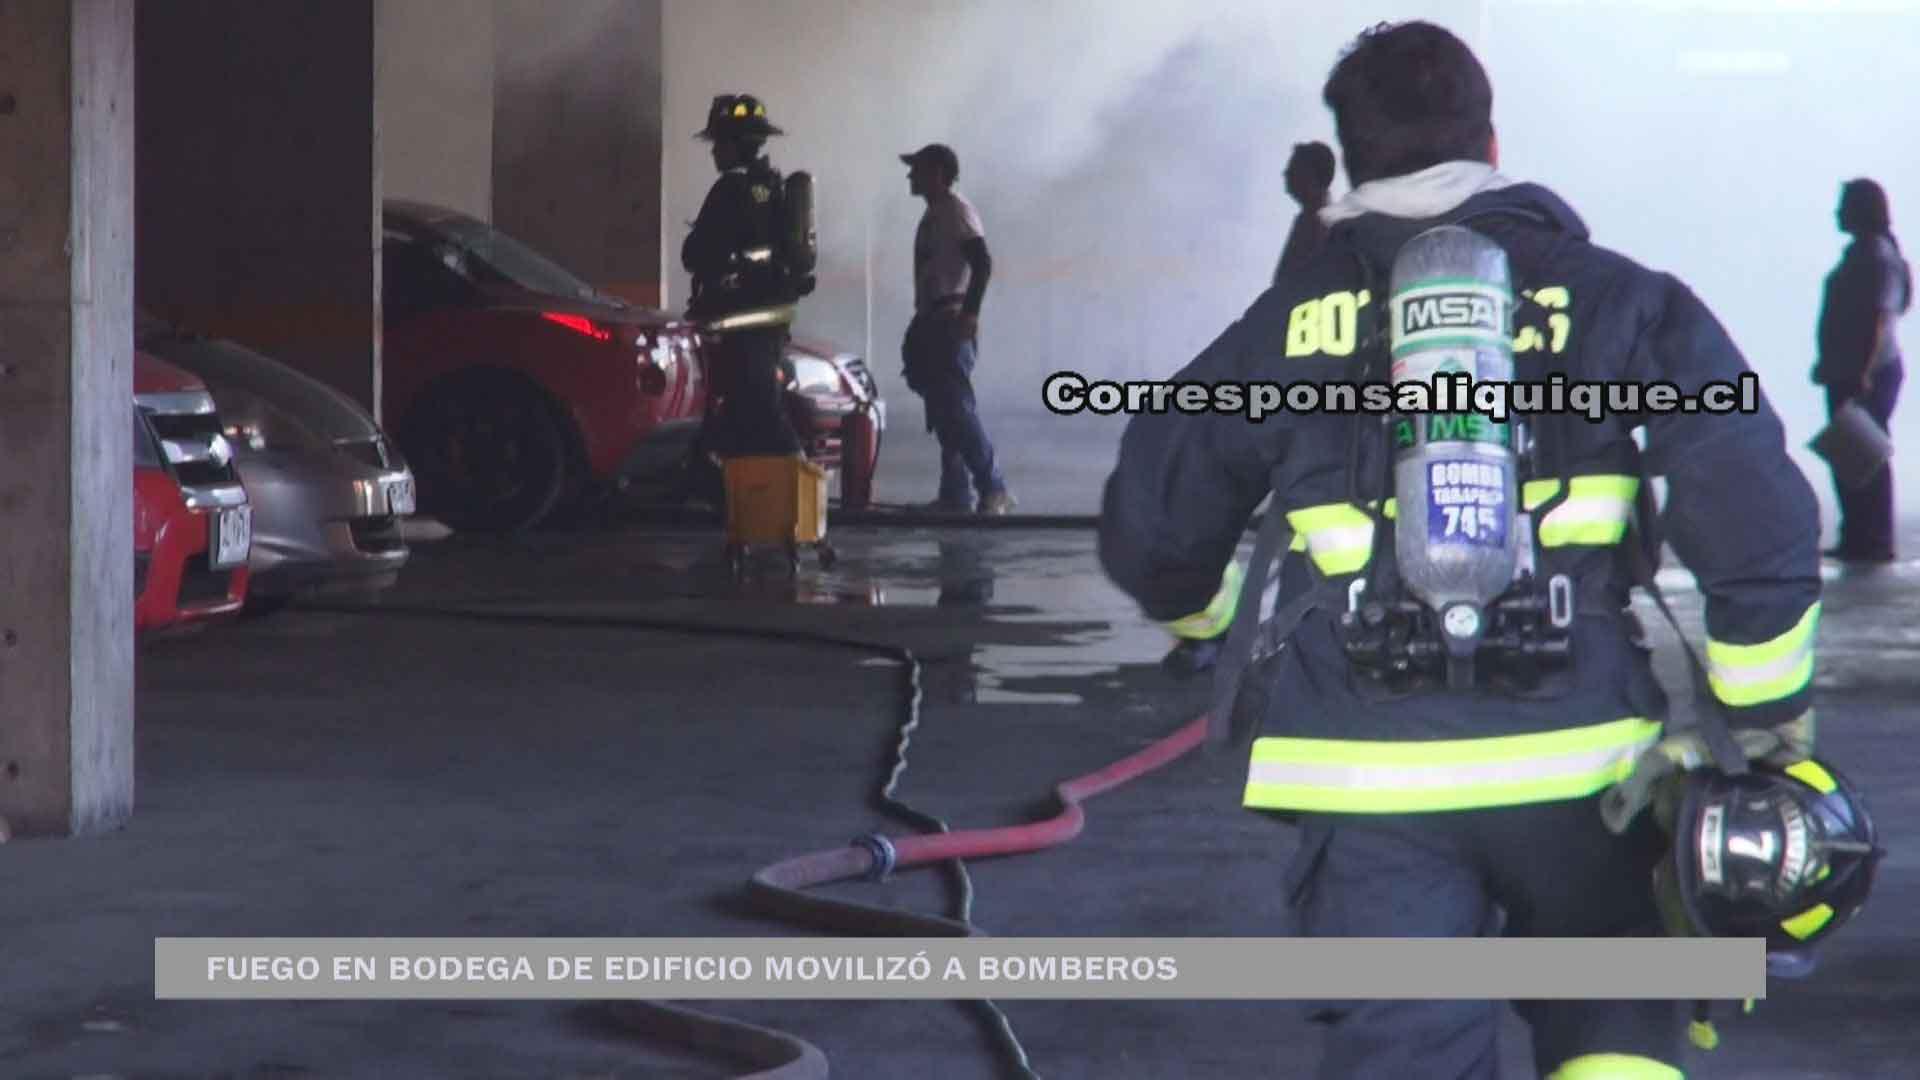 Photo of Fuego en bodega de edificio movilizó a Bomberos